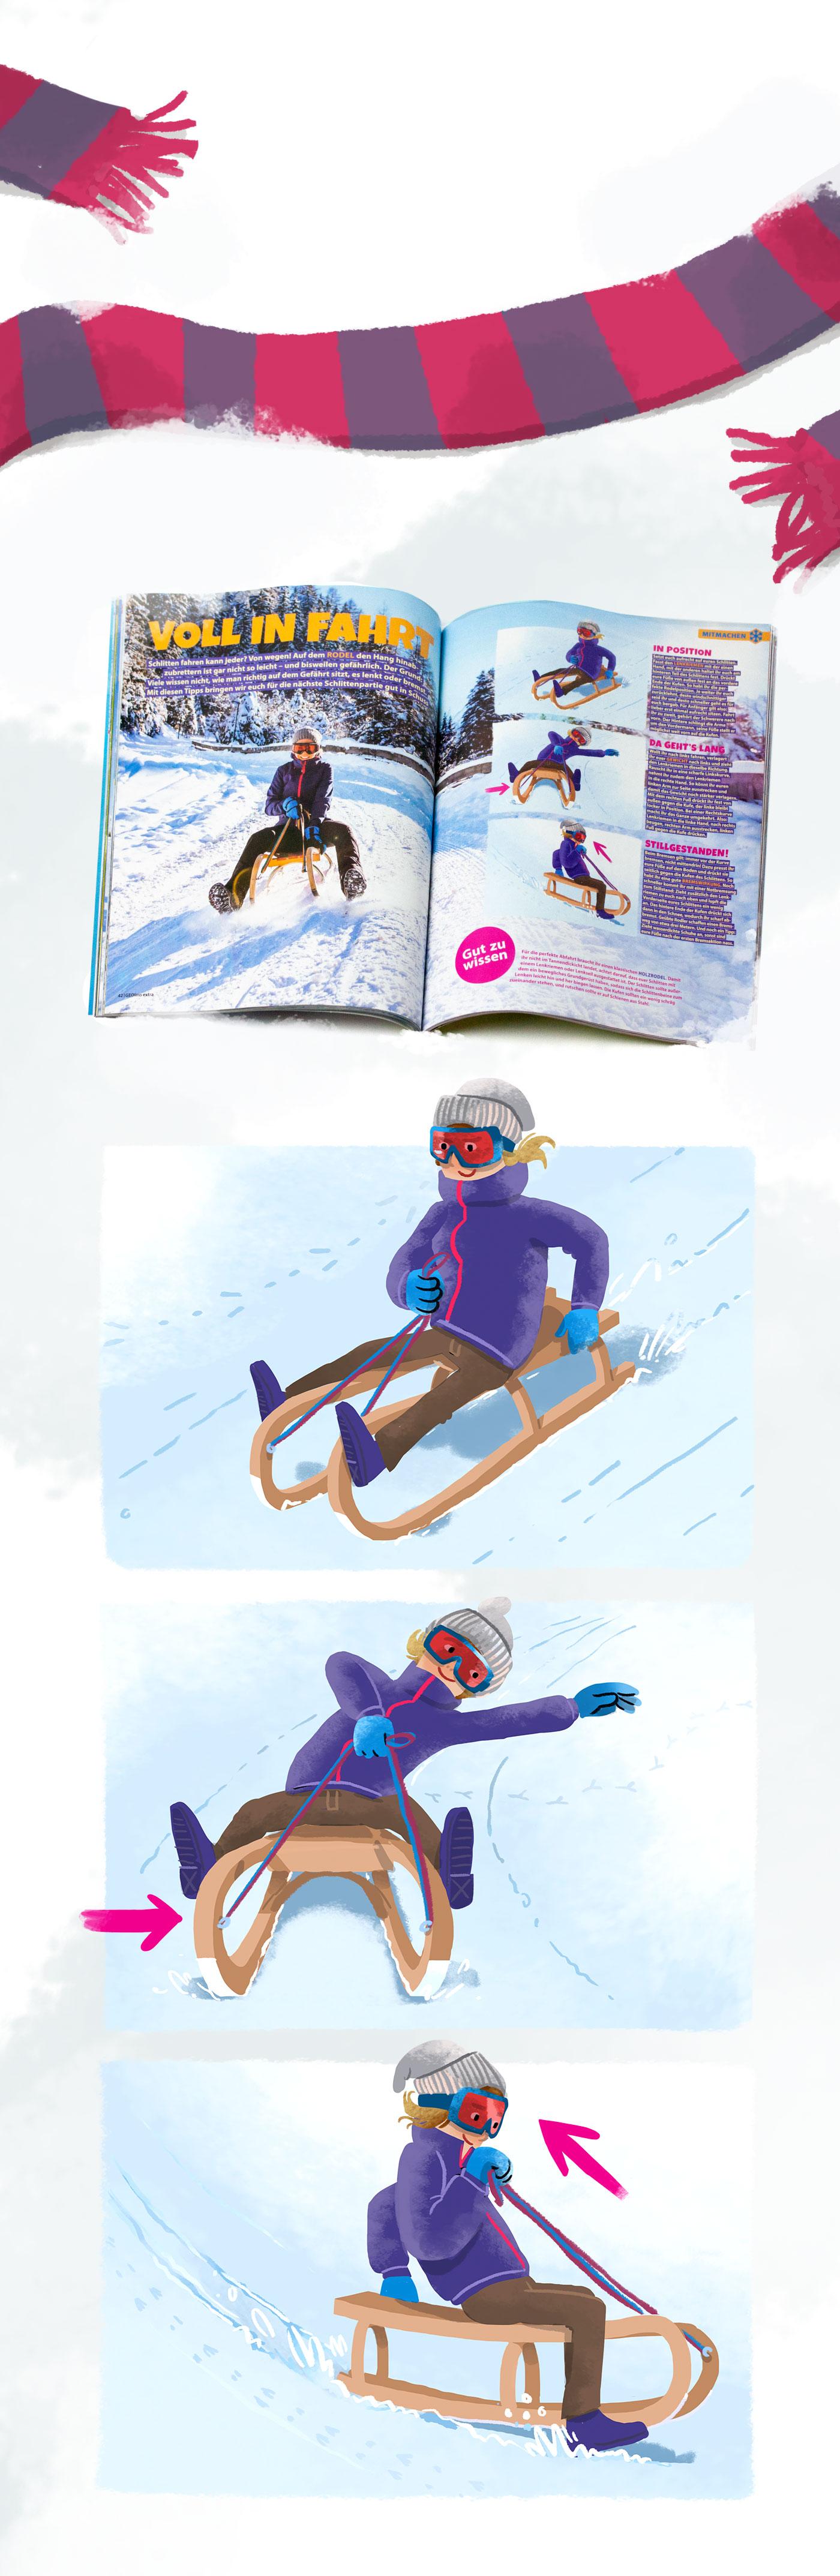 geolino_winter__05.jpg